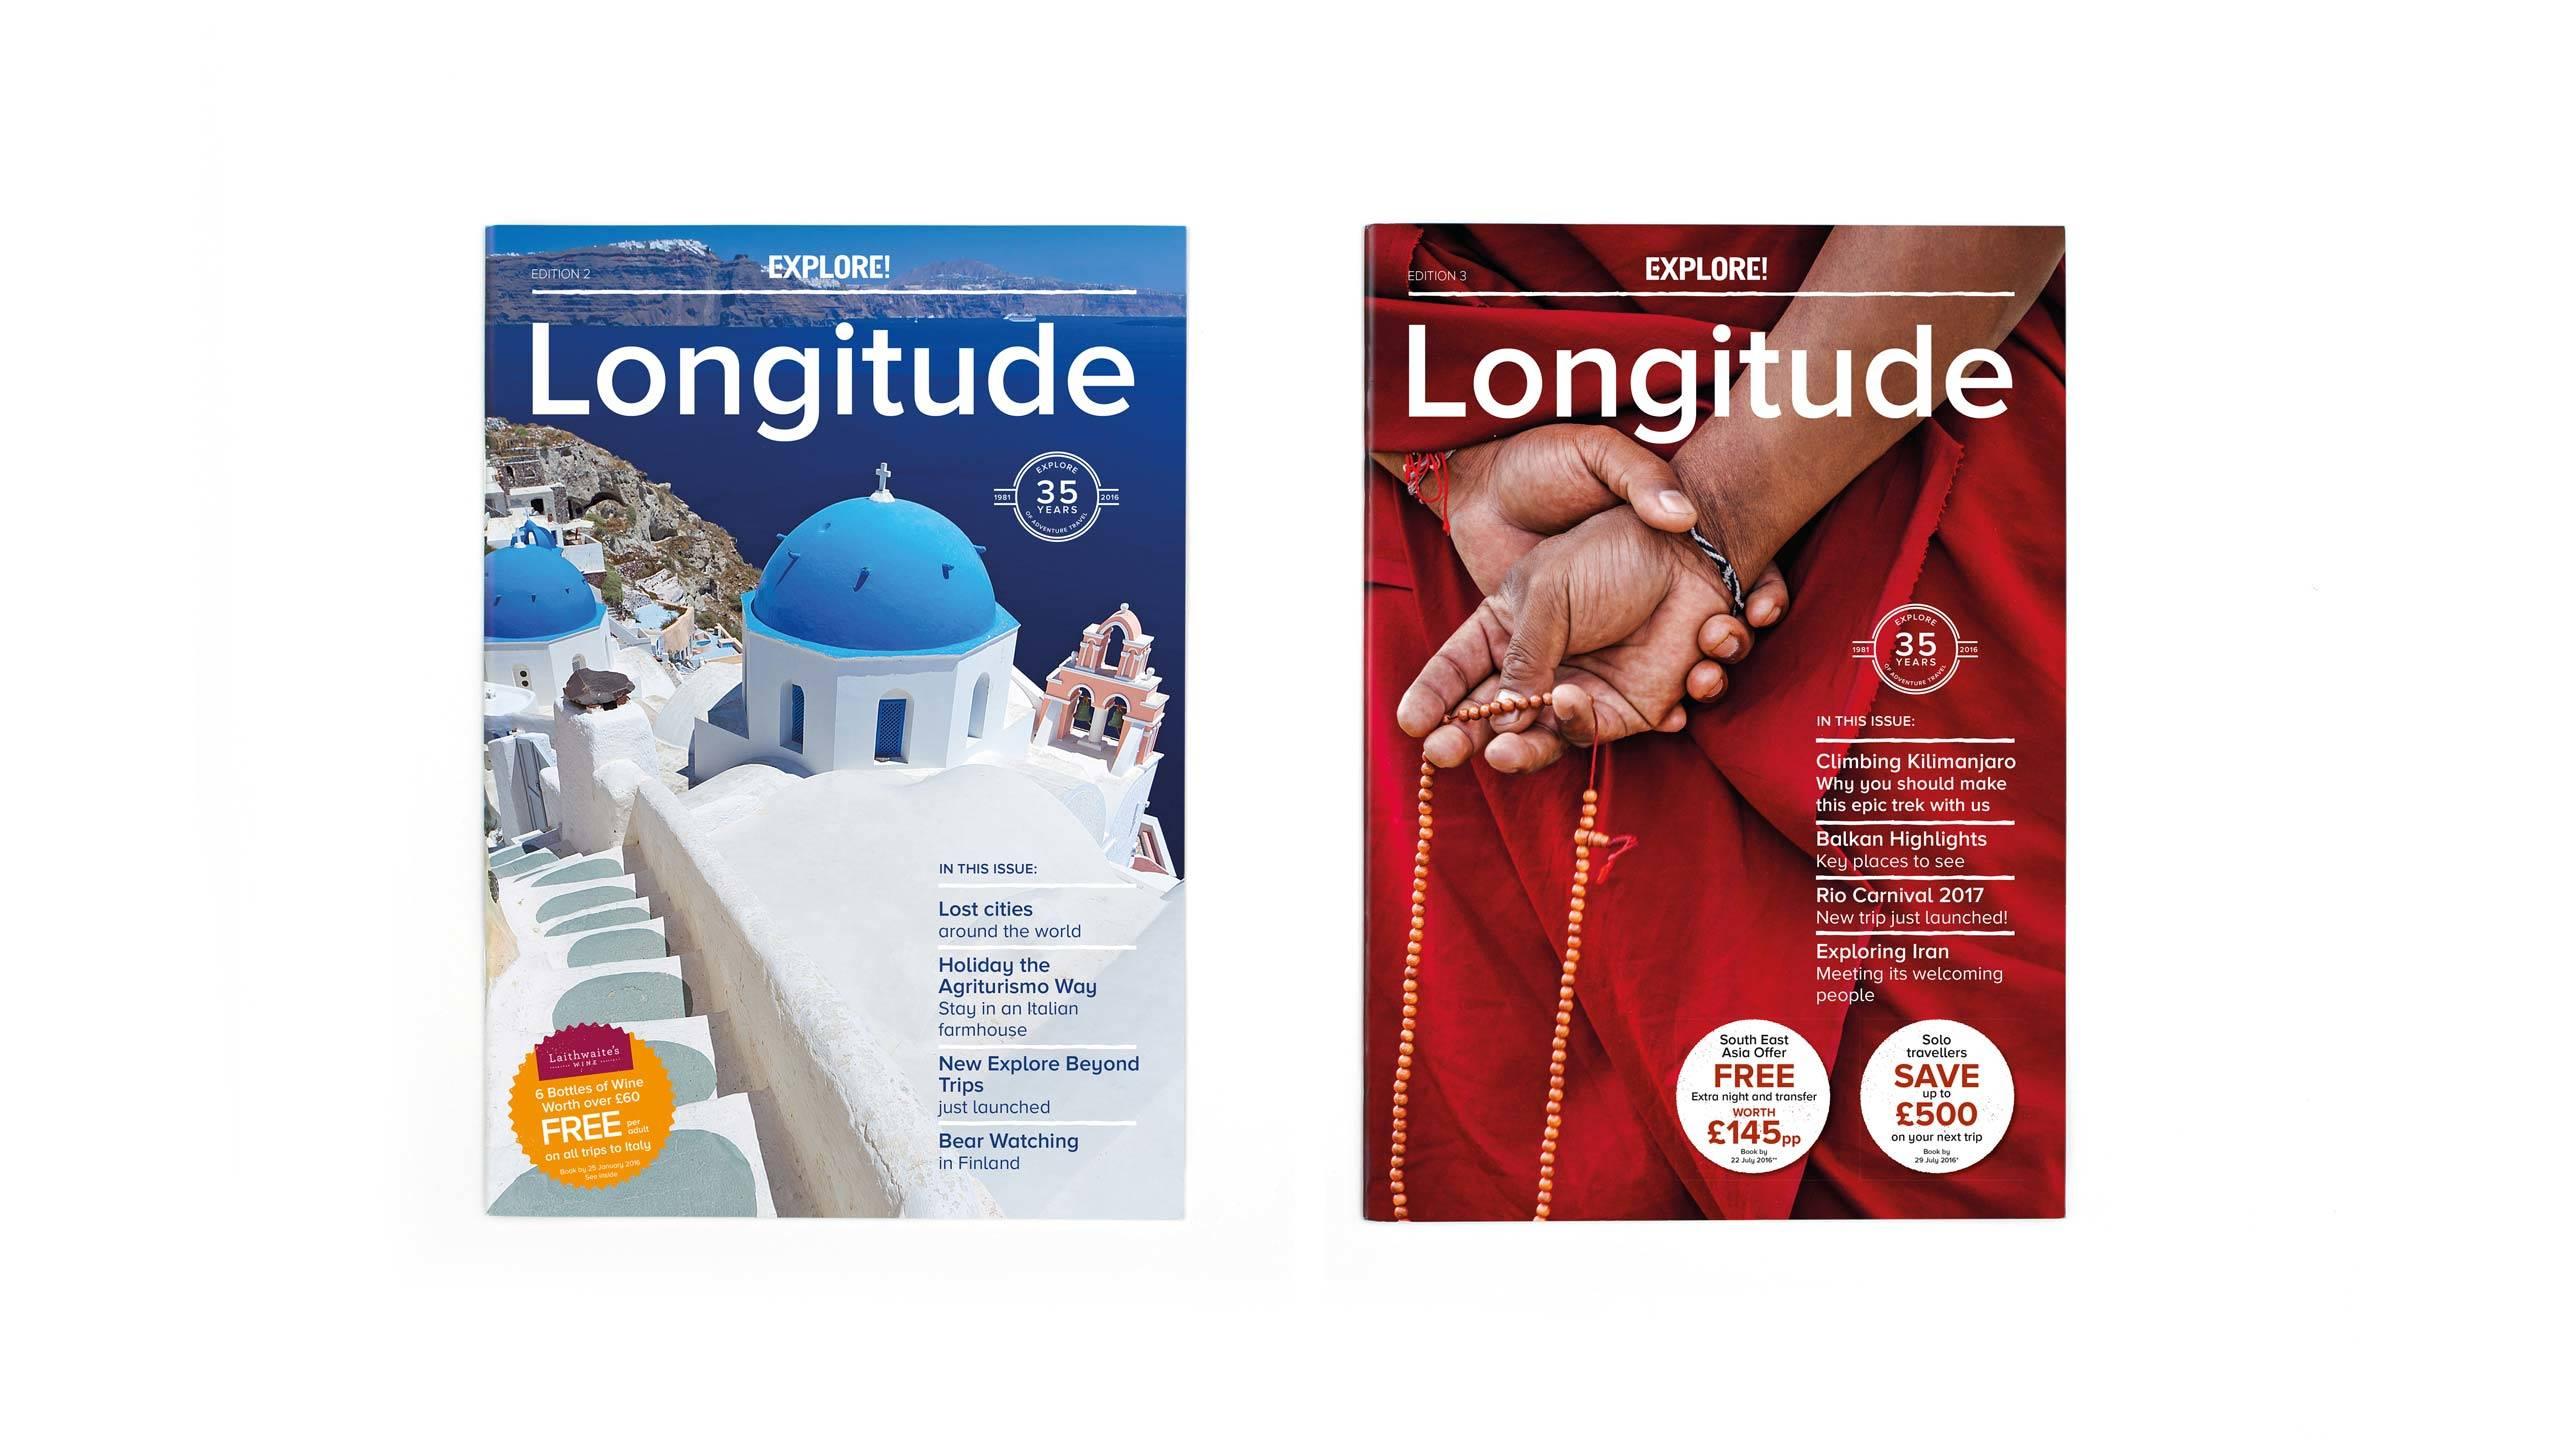 Longitude covers